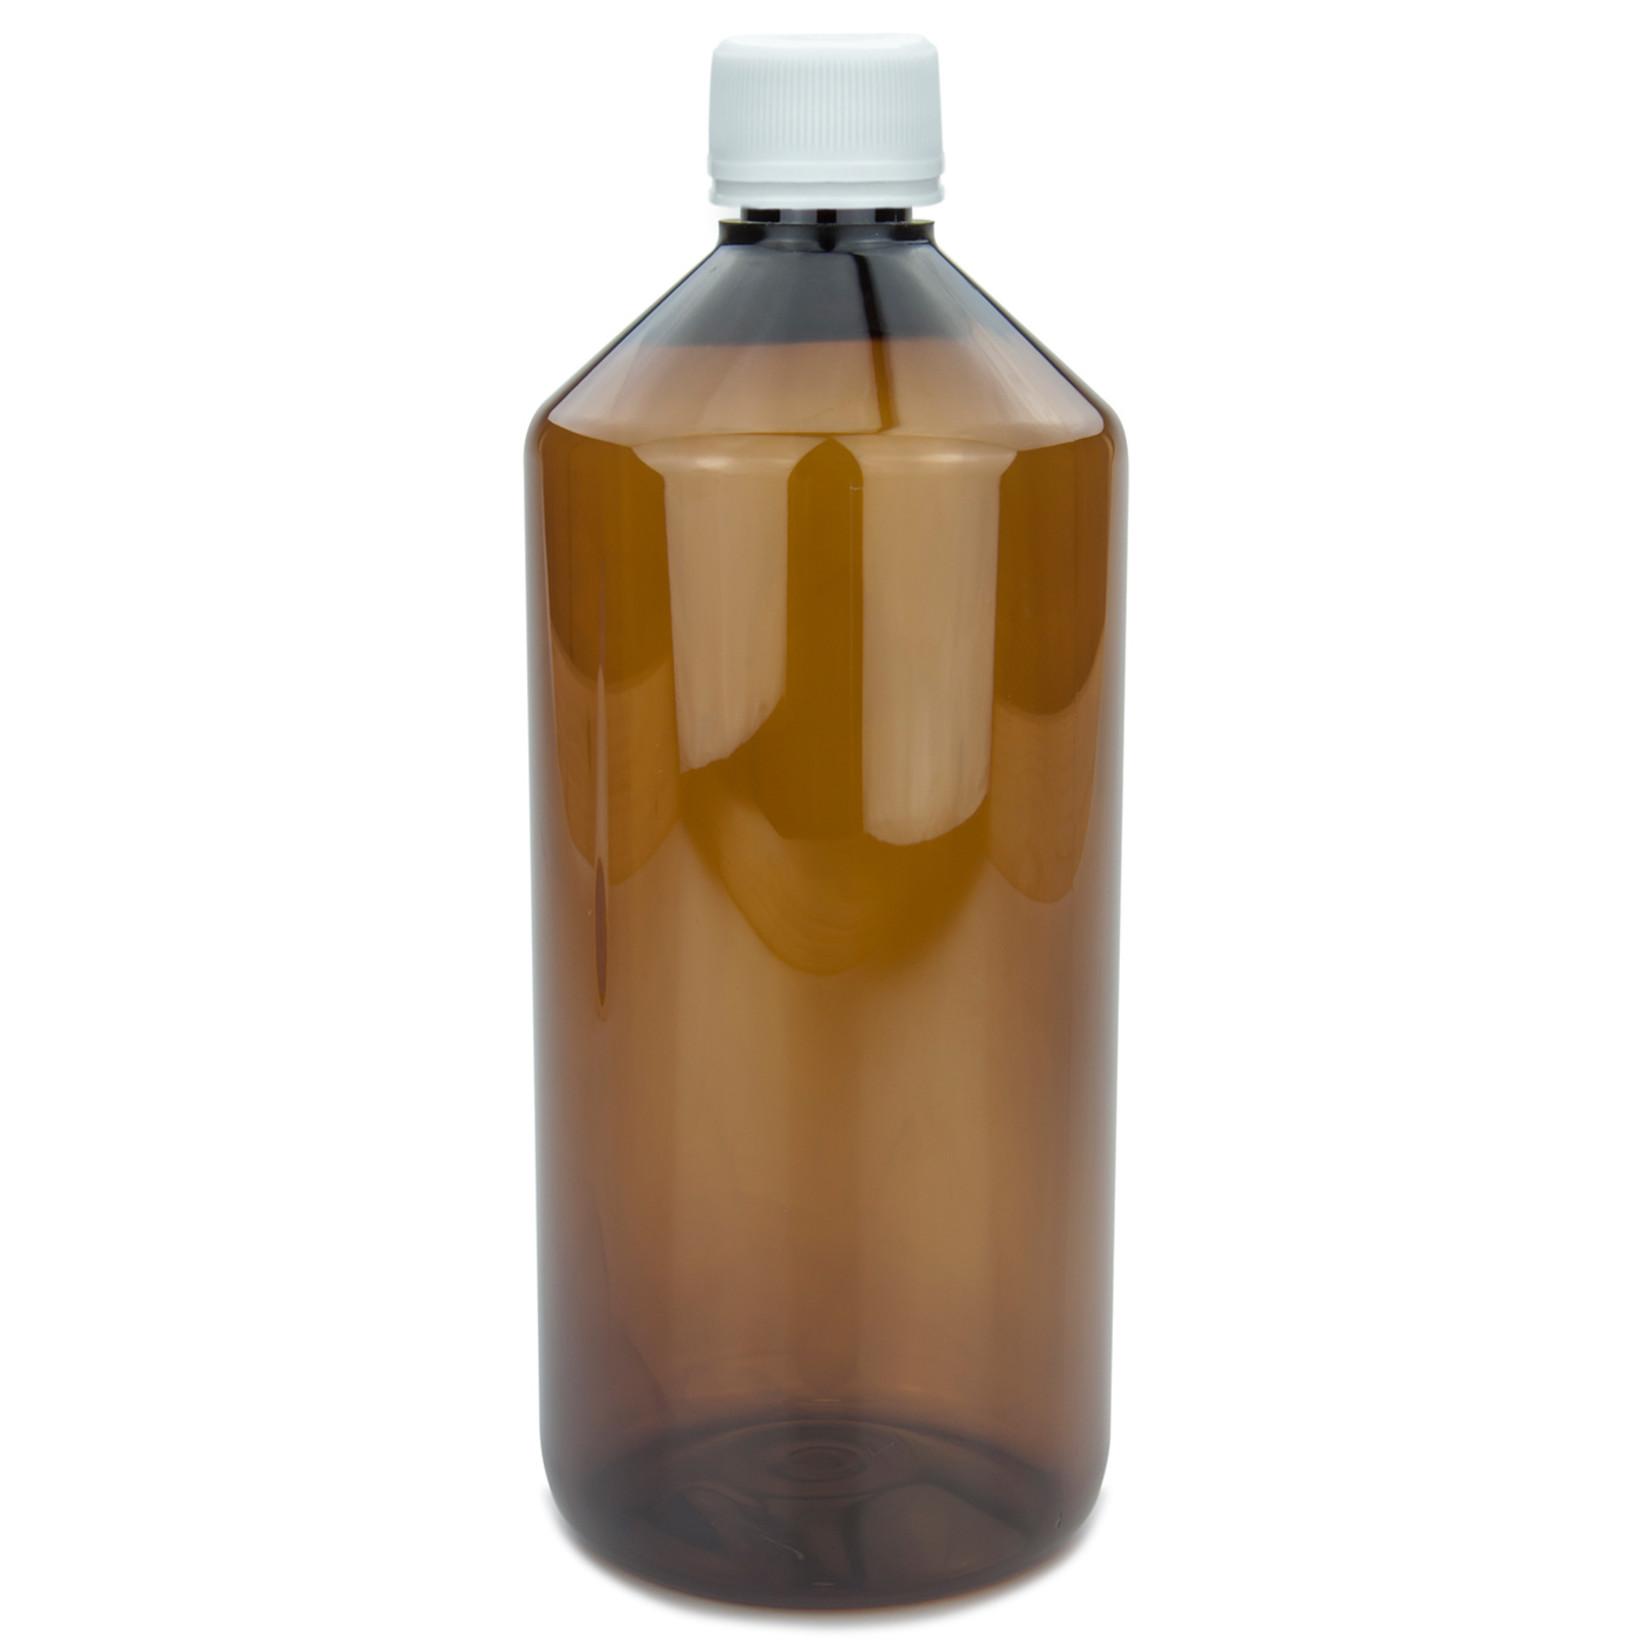 VPG 50/50 Nikotin-Salz Base 3-36 mg/ml 250-1000ml